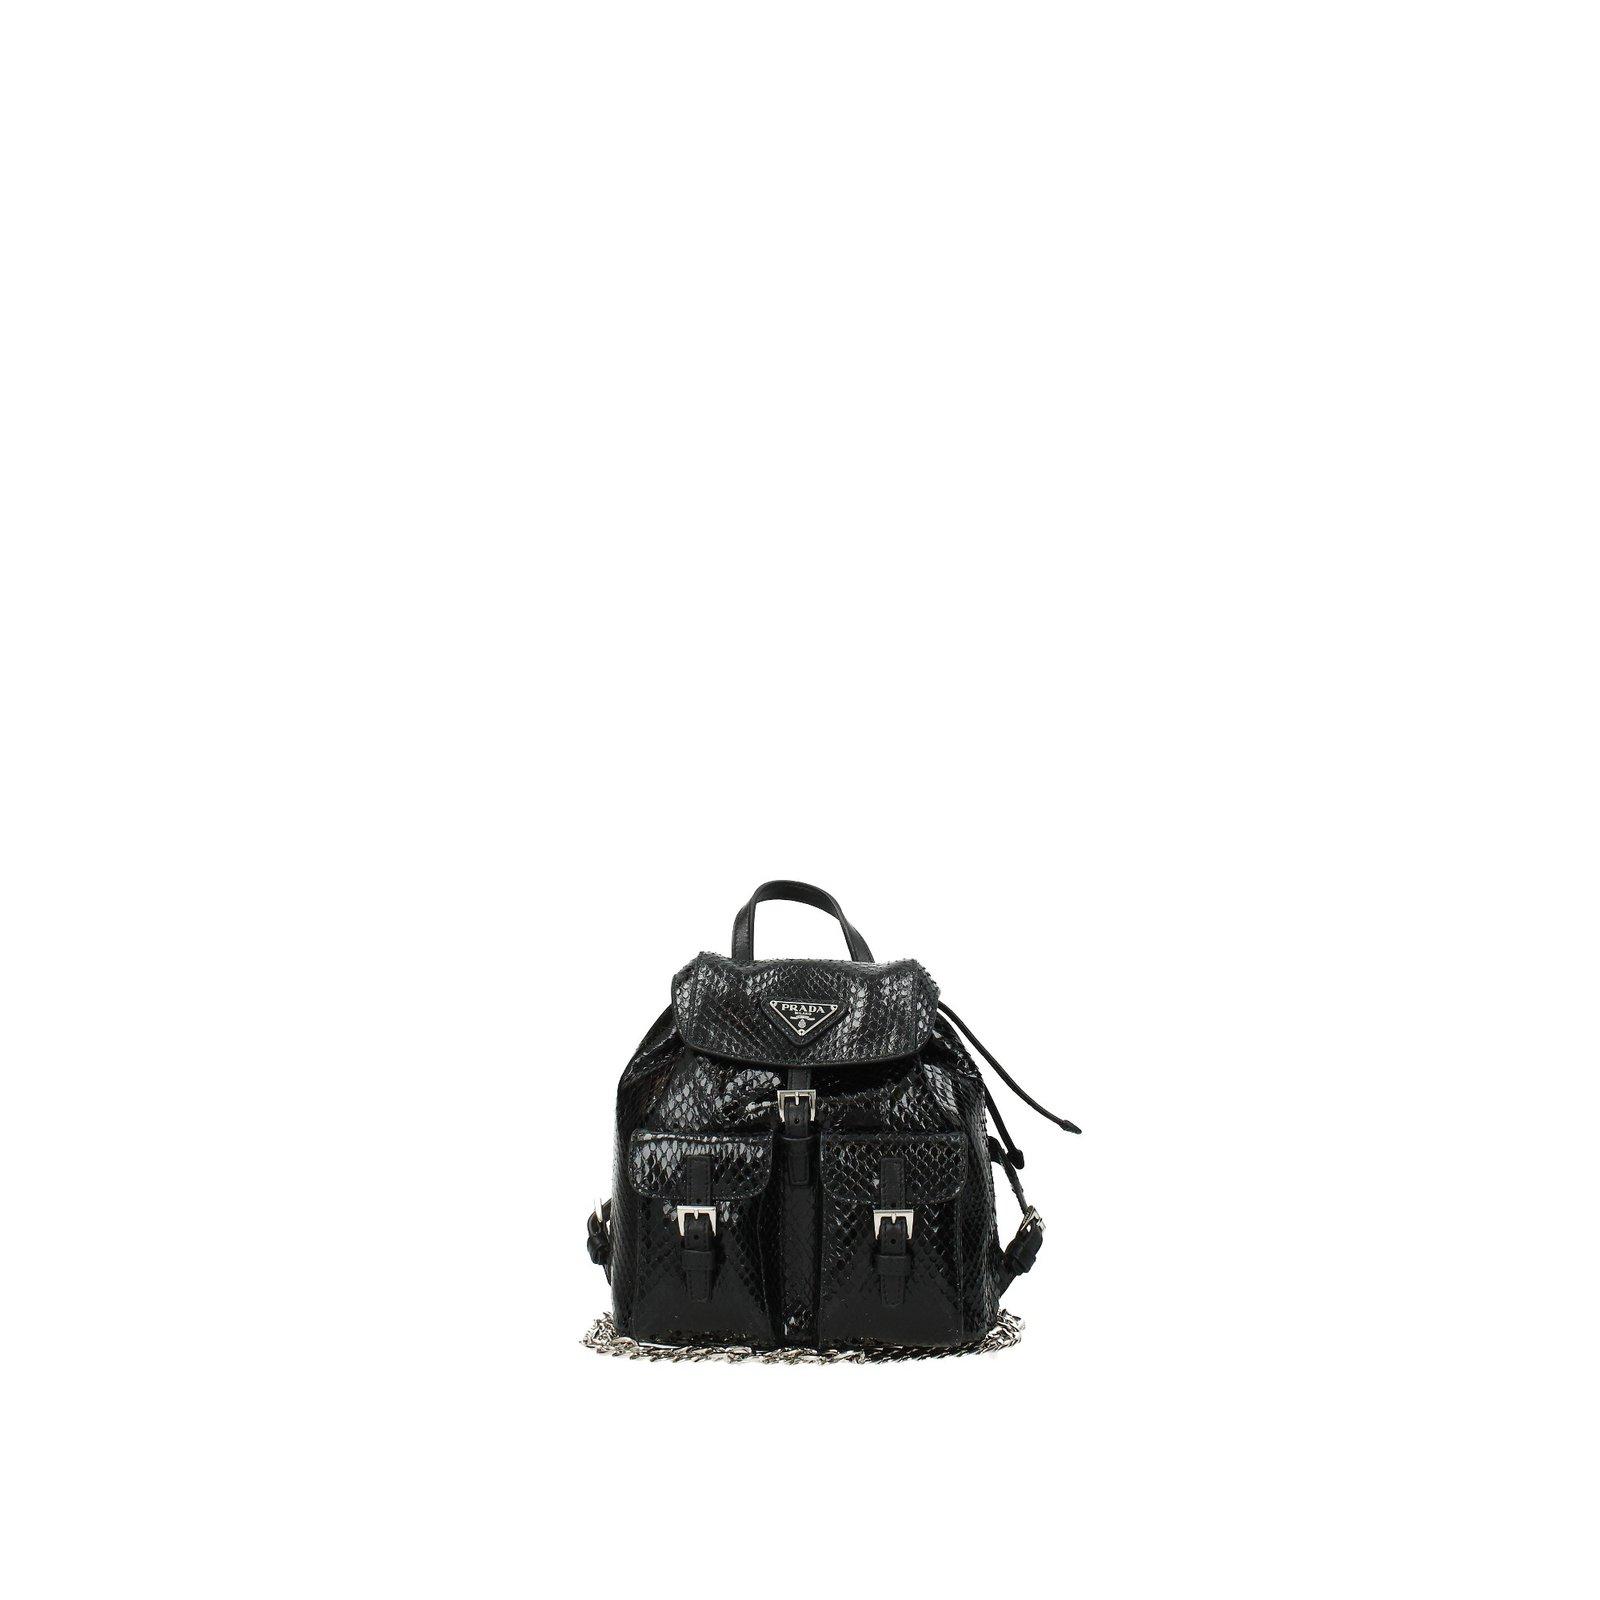 816dfb6c12c6 norway prada buckle flap crossbody bag black 31a5e f5970; reduced prada  crossbody backpack bag backpacks leather black ref.75164 6d671 b3b06